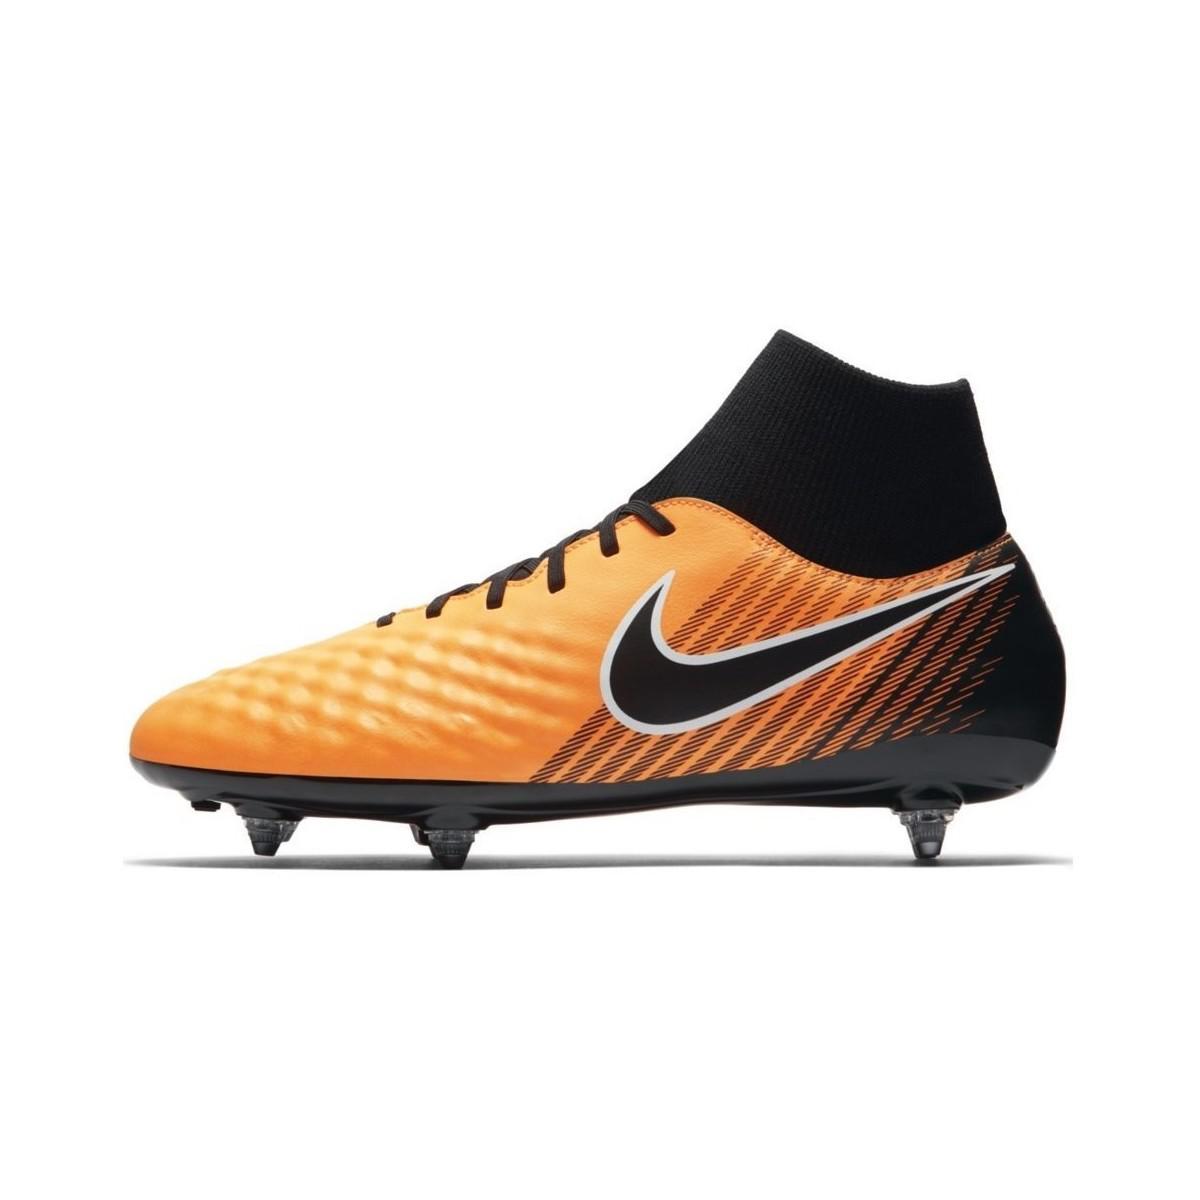 2a4fb6d6452a Nike Magista Onda Ii Df Sg Men's Football Boots In Black in Black ...